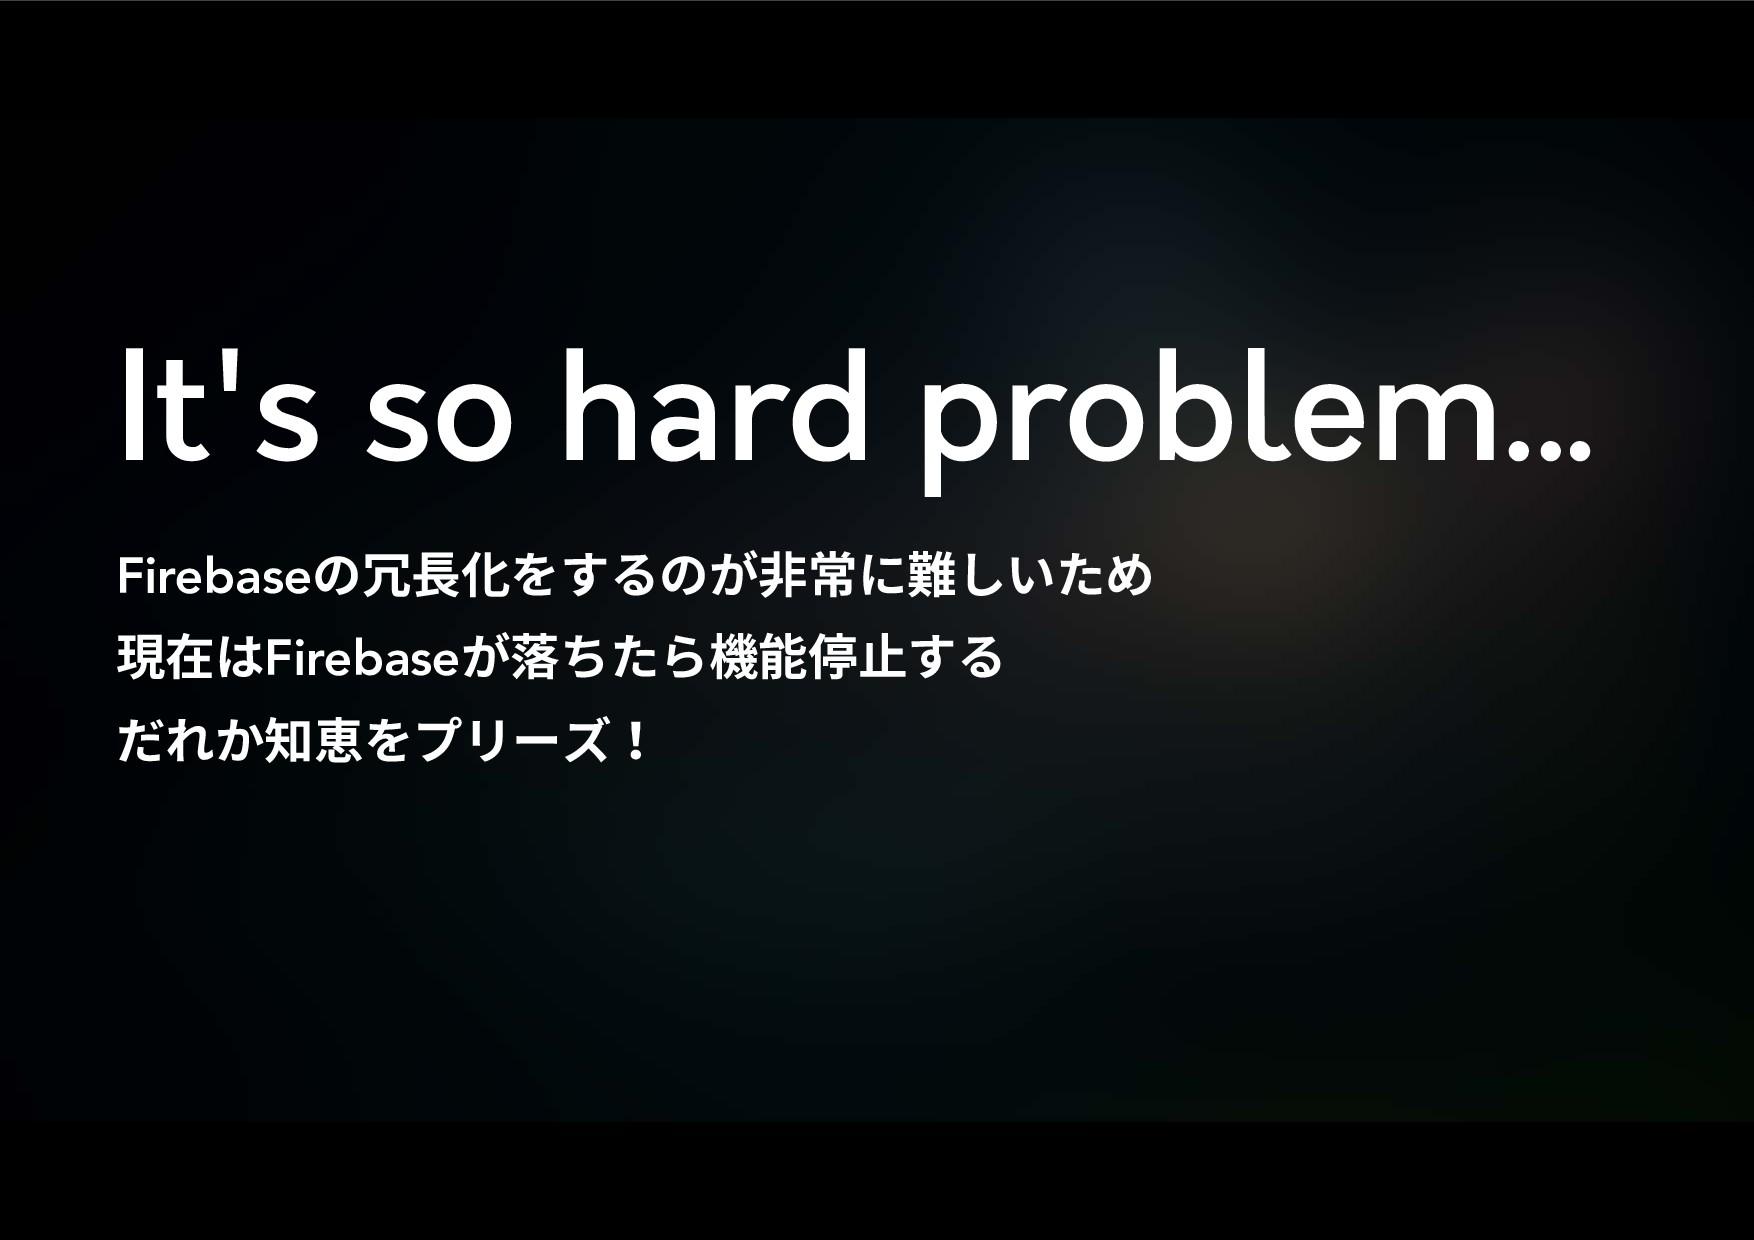 It's so hard problem… Firebaseךⱔꞿ⻉ׅךָꬊ䌢חꨇ׃ְ...